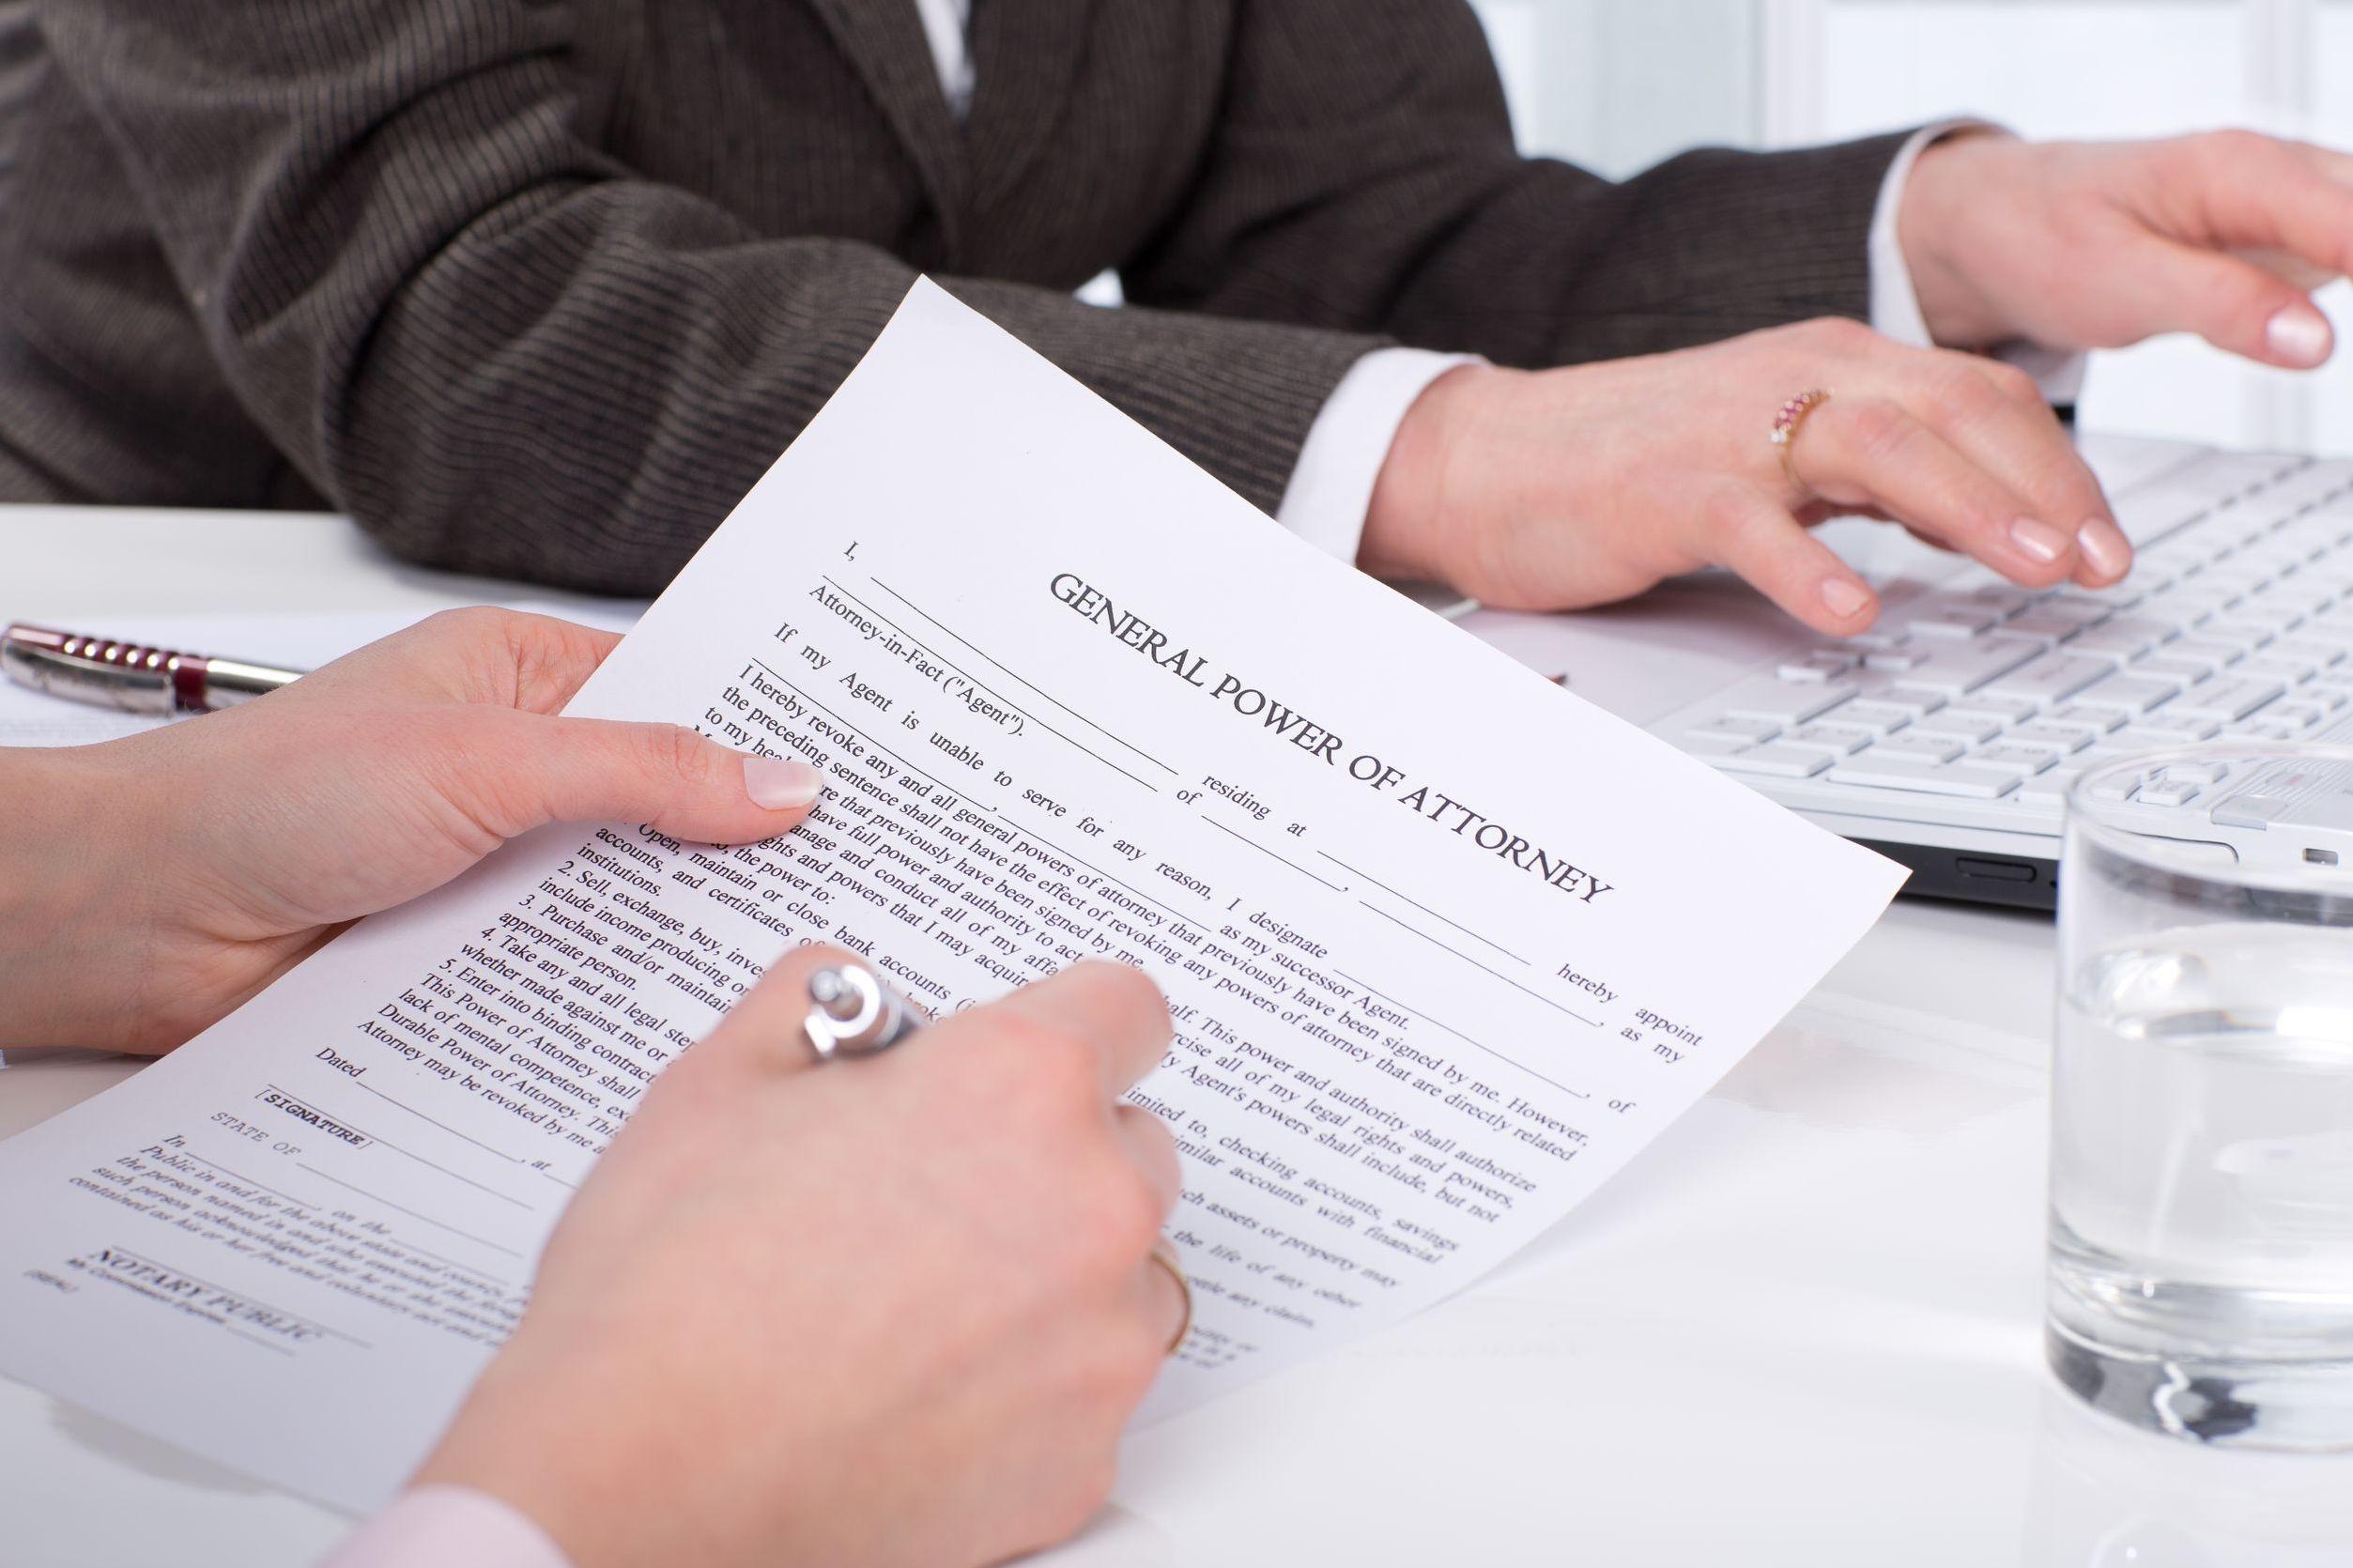 Poder notarial extranjero. El test de equivalencia